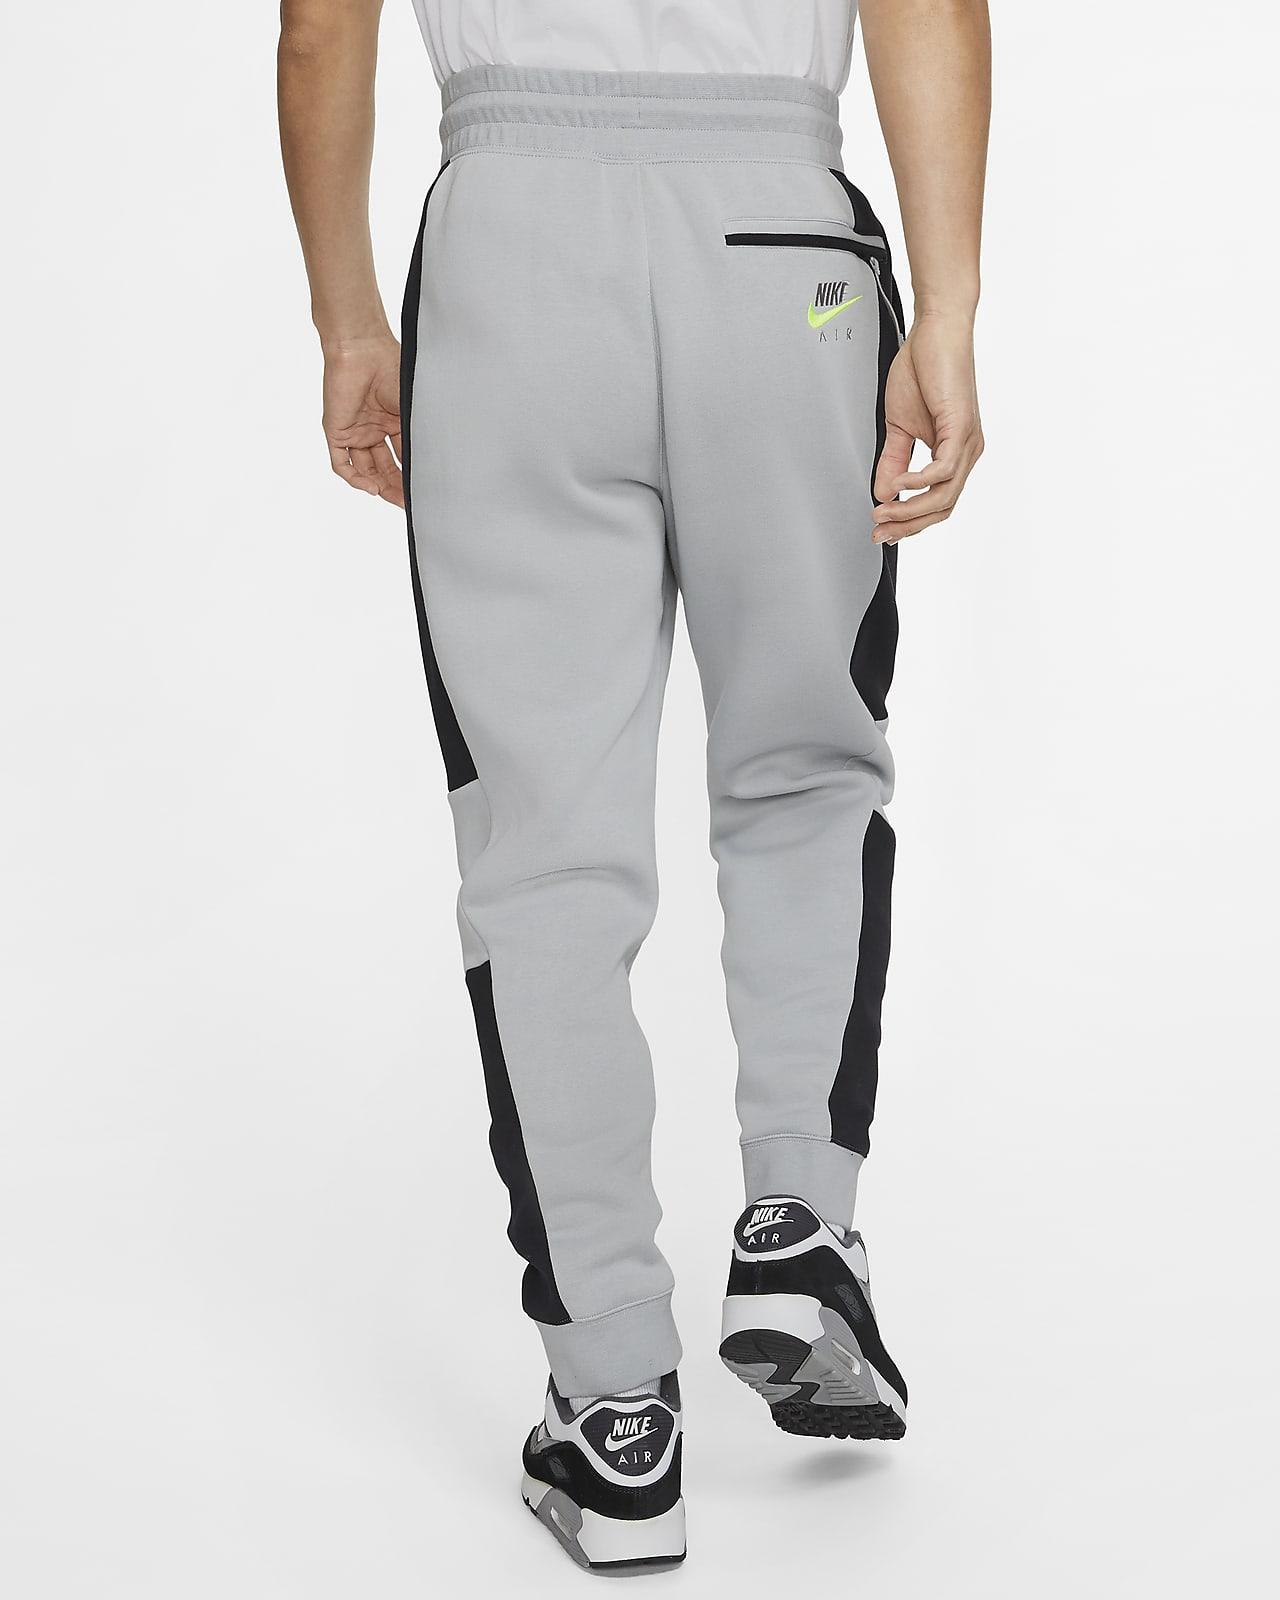 Nike Air Men's Fleece Trousers. Nike VN